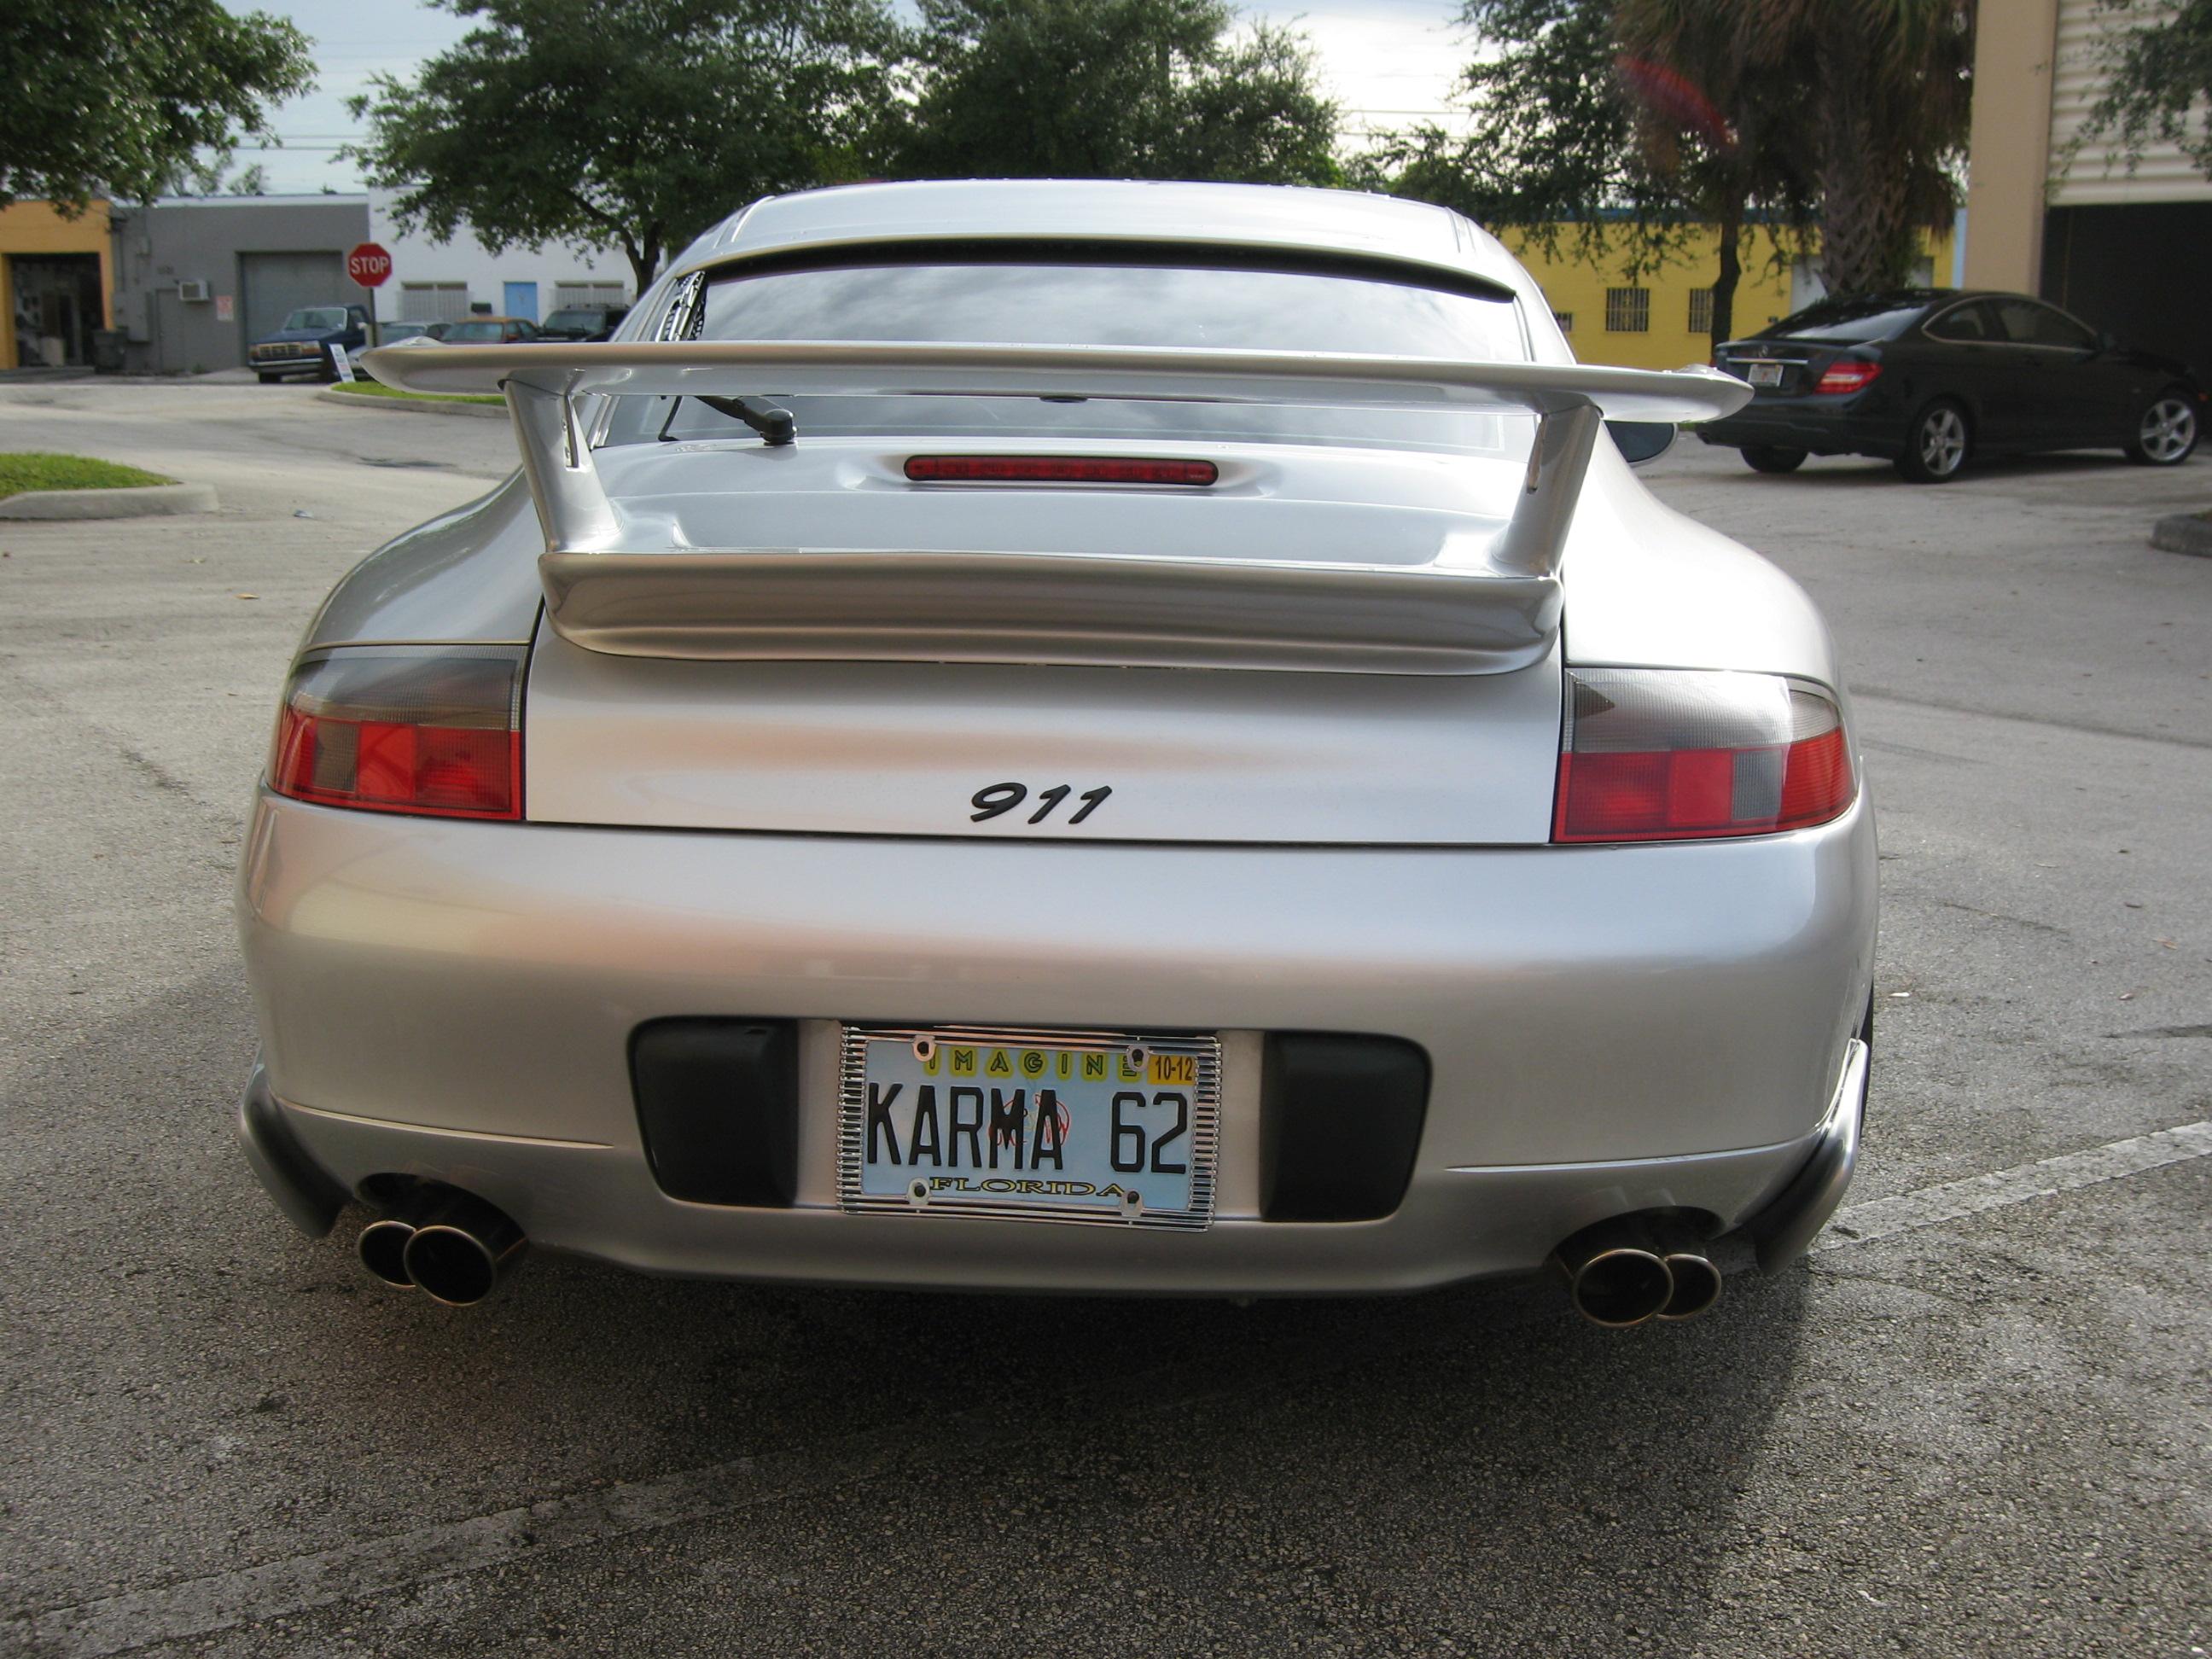 2004 Porsche 996 Cup For Sale: 1997-2004 Porsche 911 / 996 Aero Cup Style 2pc Side Rear